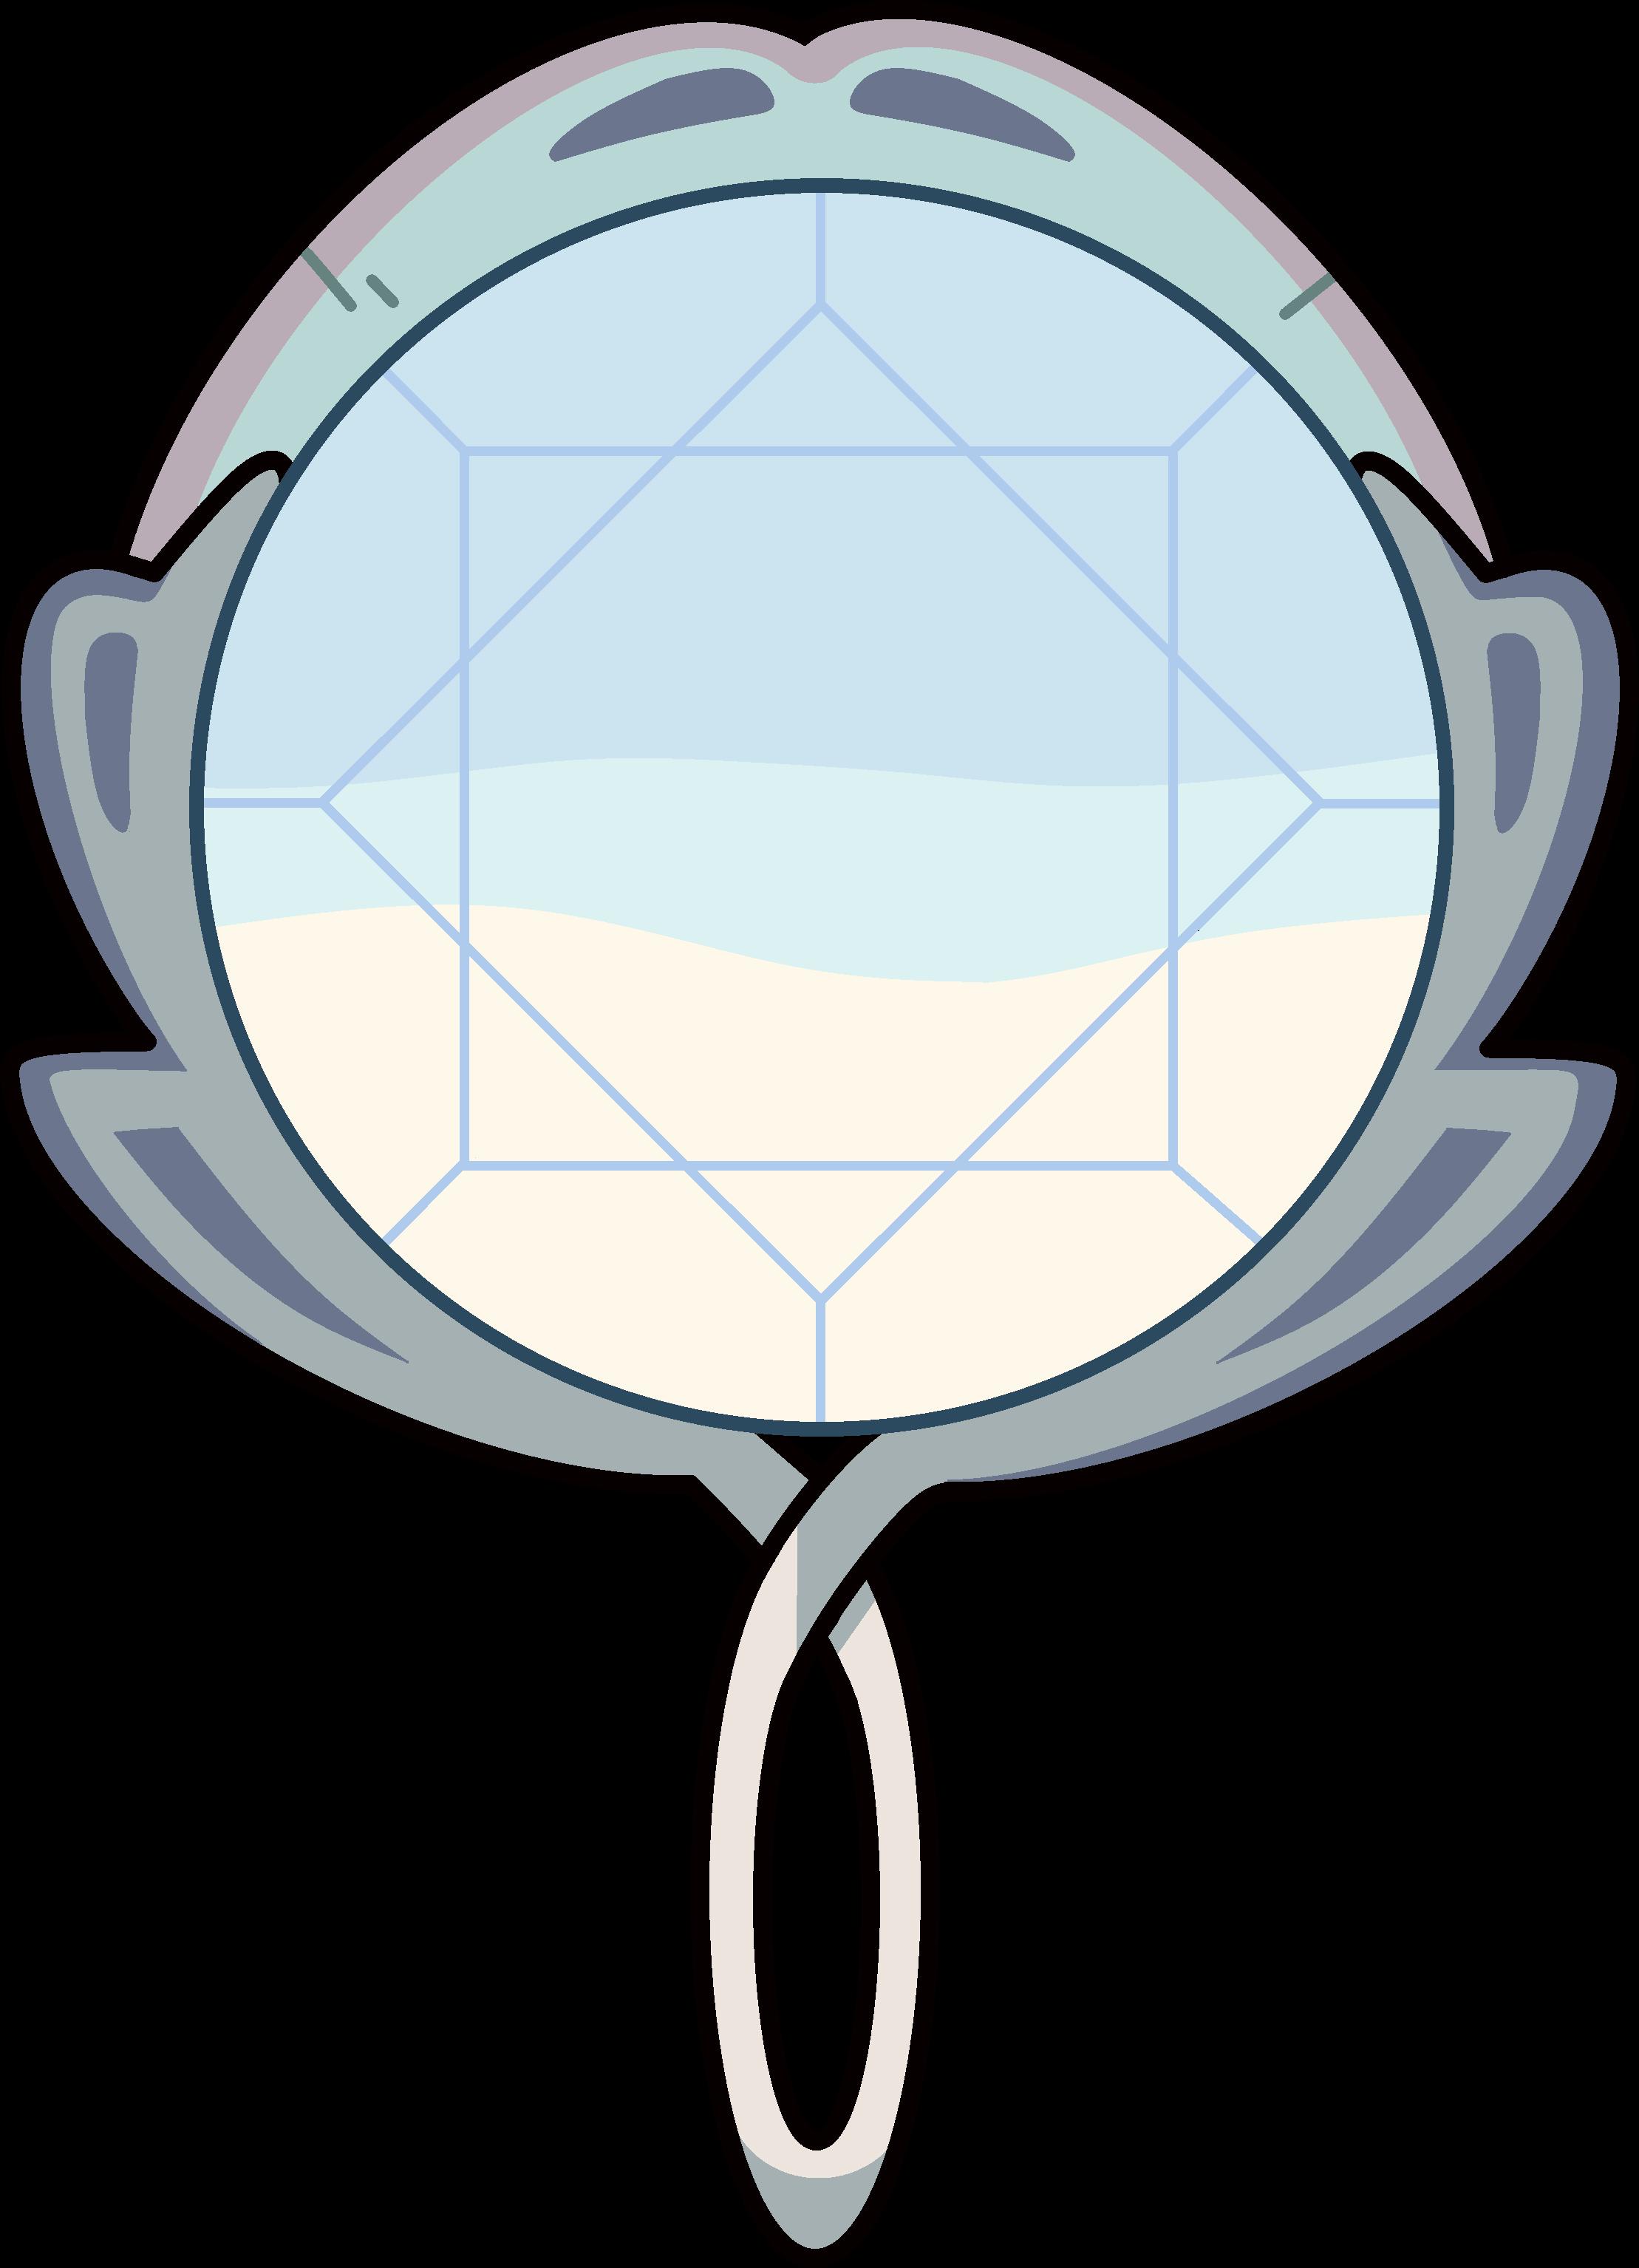 The steven universe wiki. Mirror clipart movie star